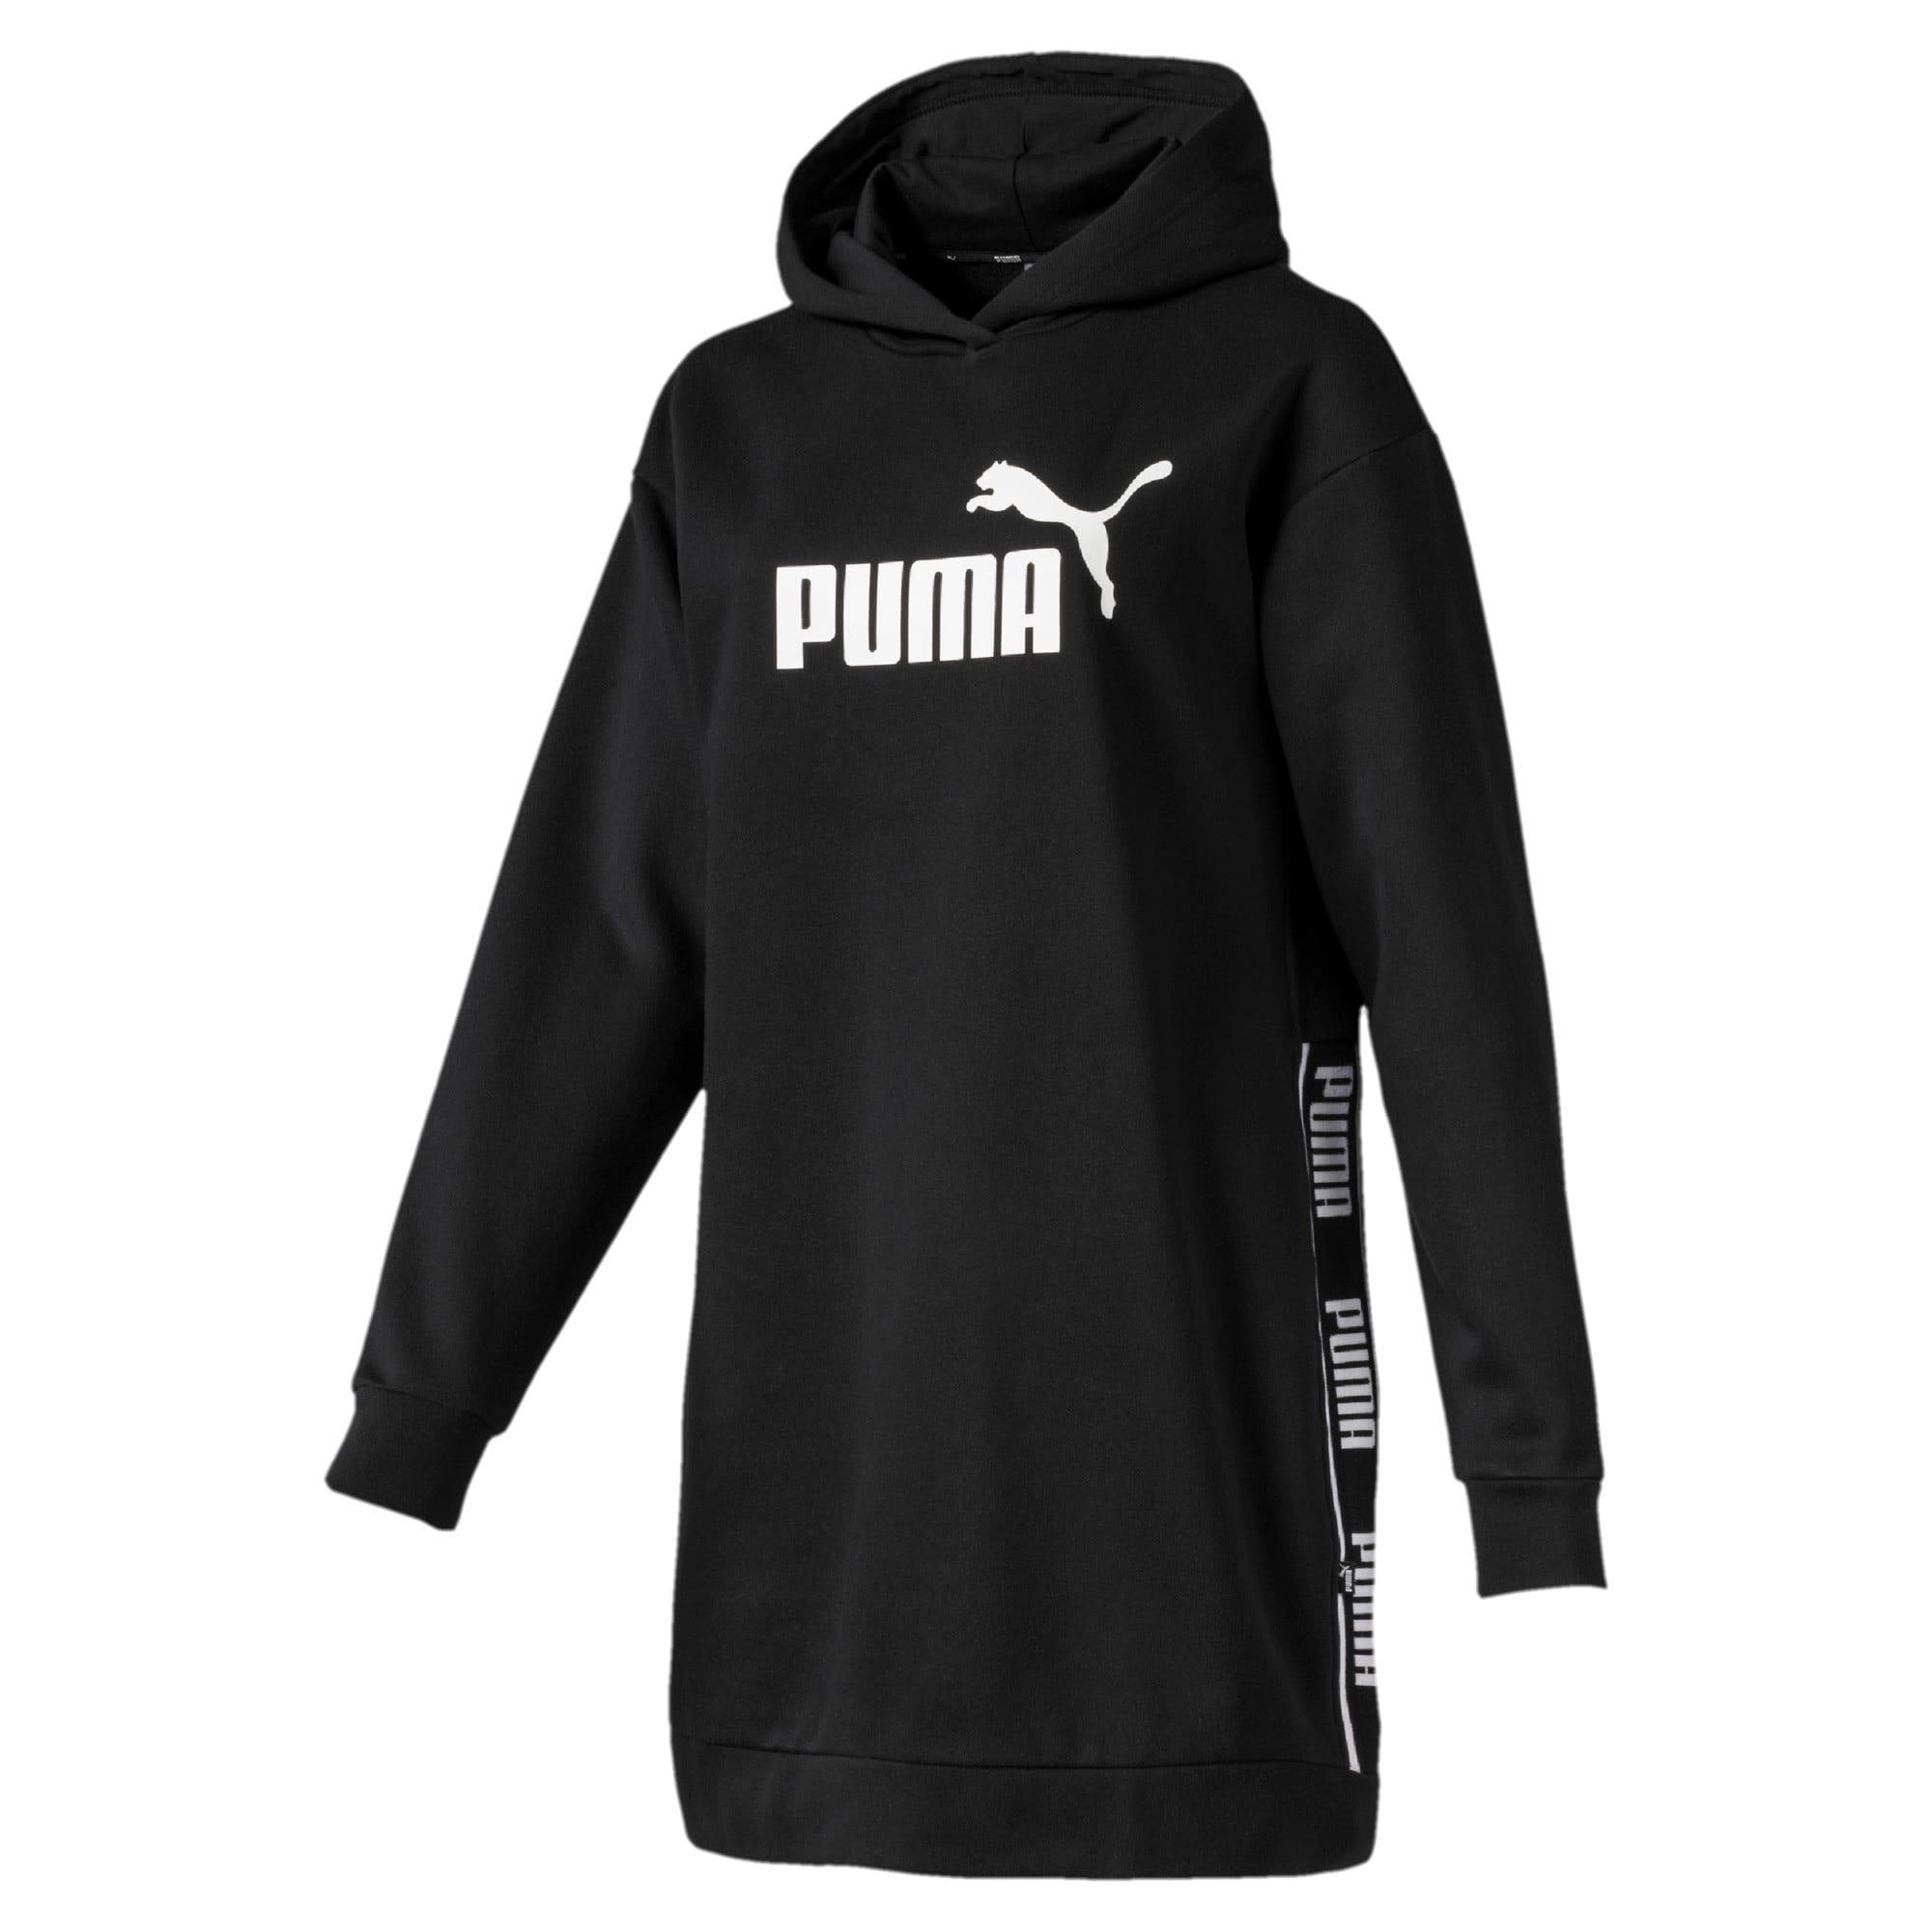 Thumbnail 1 of Amplified Women's Dress, Puma Black, medium